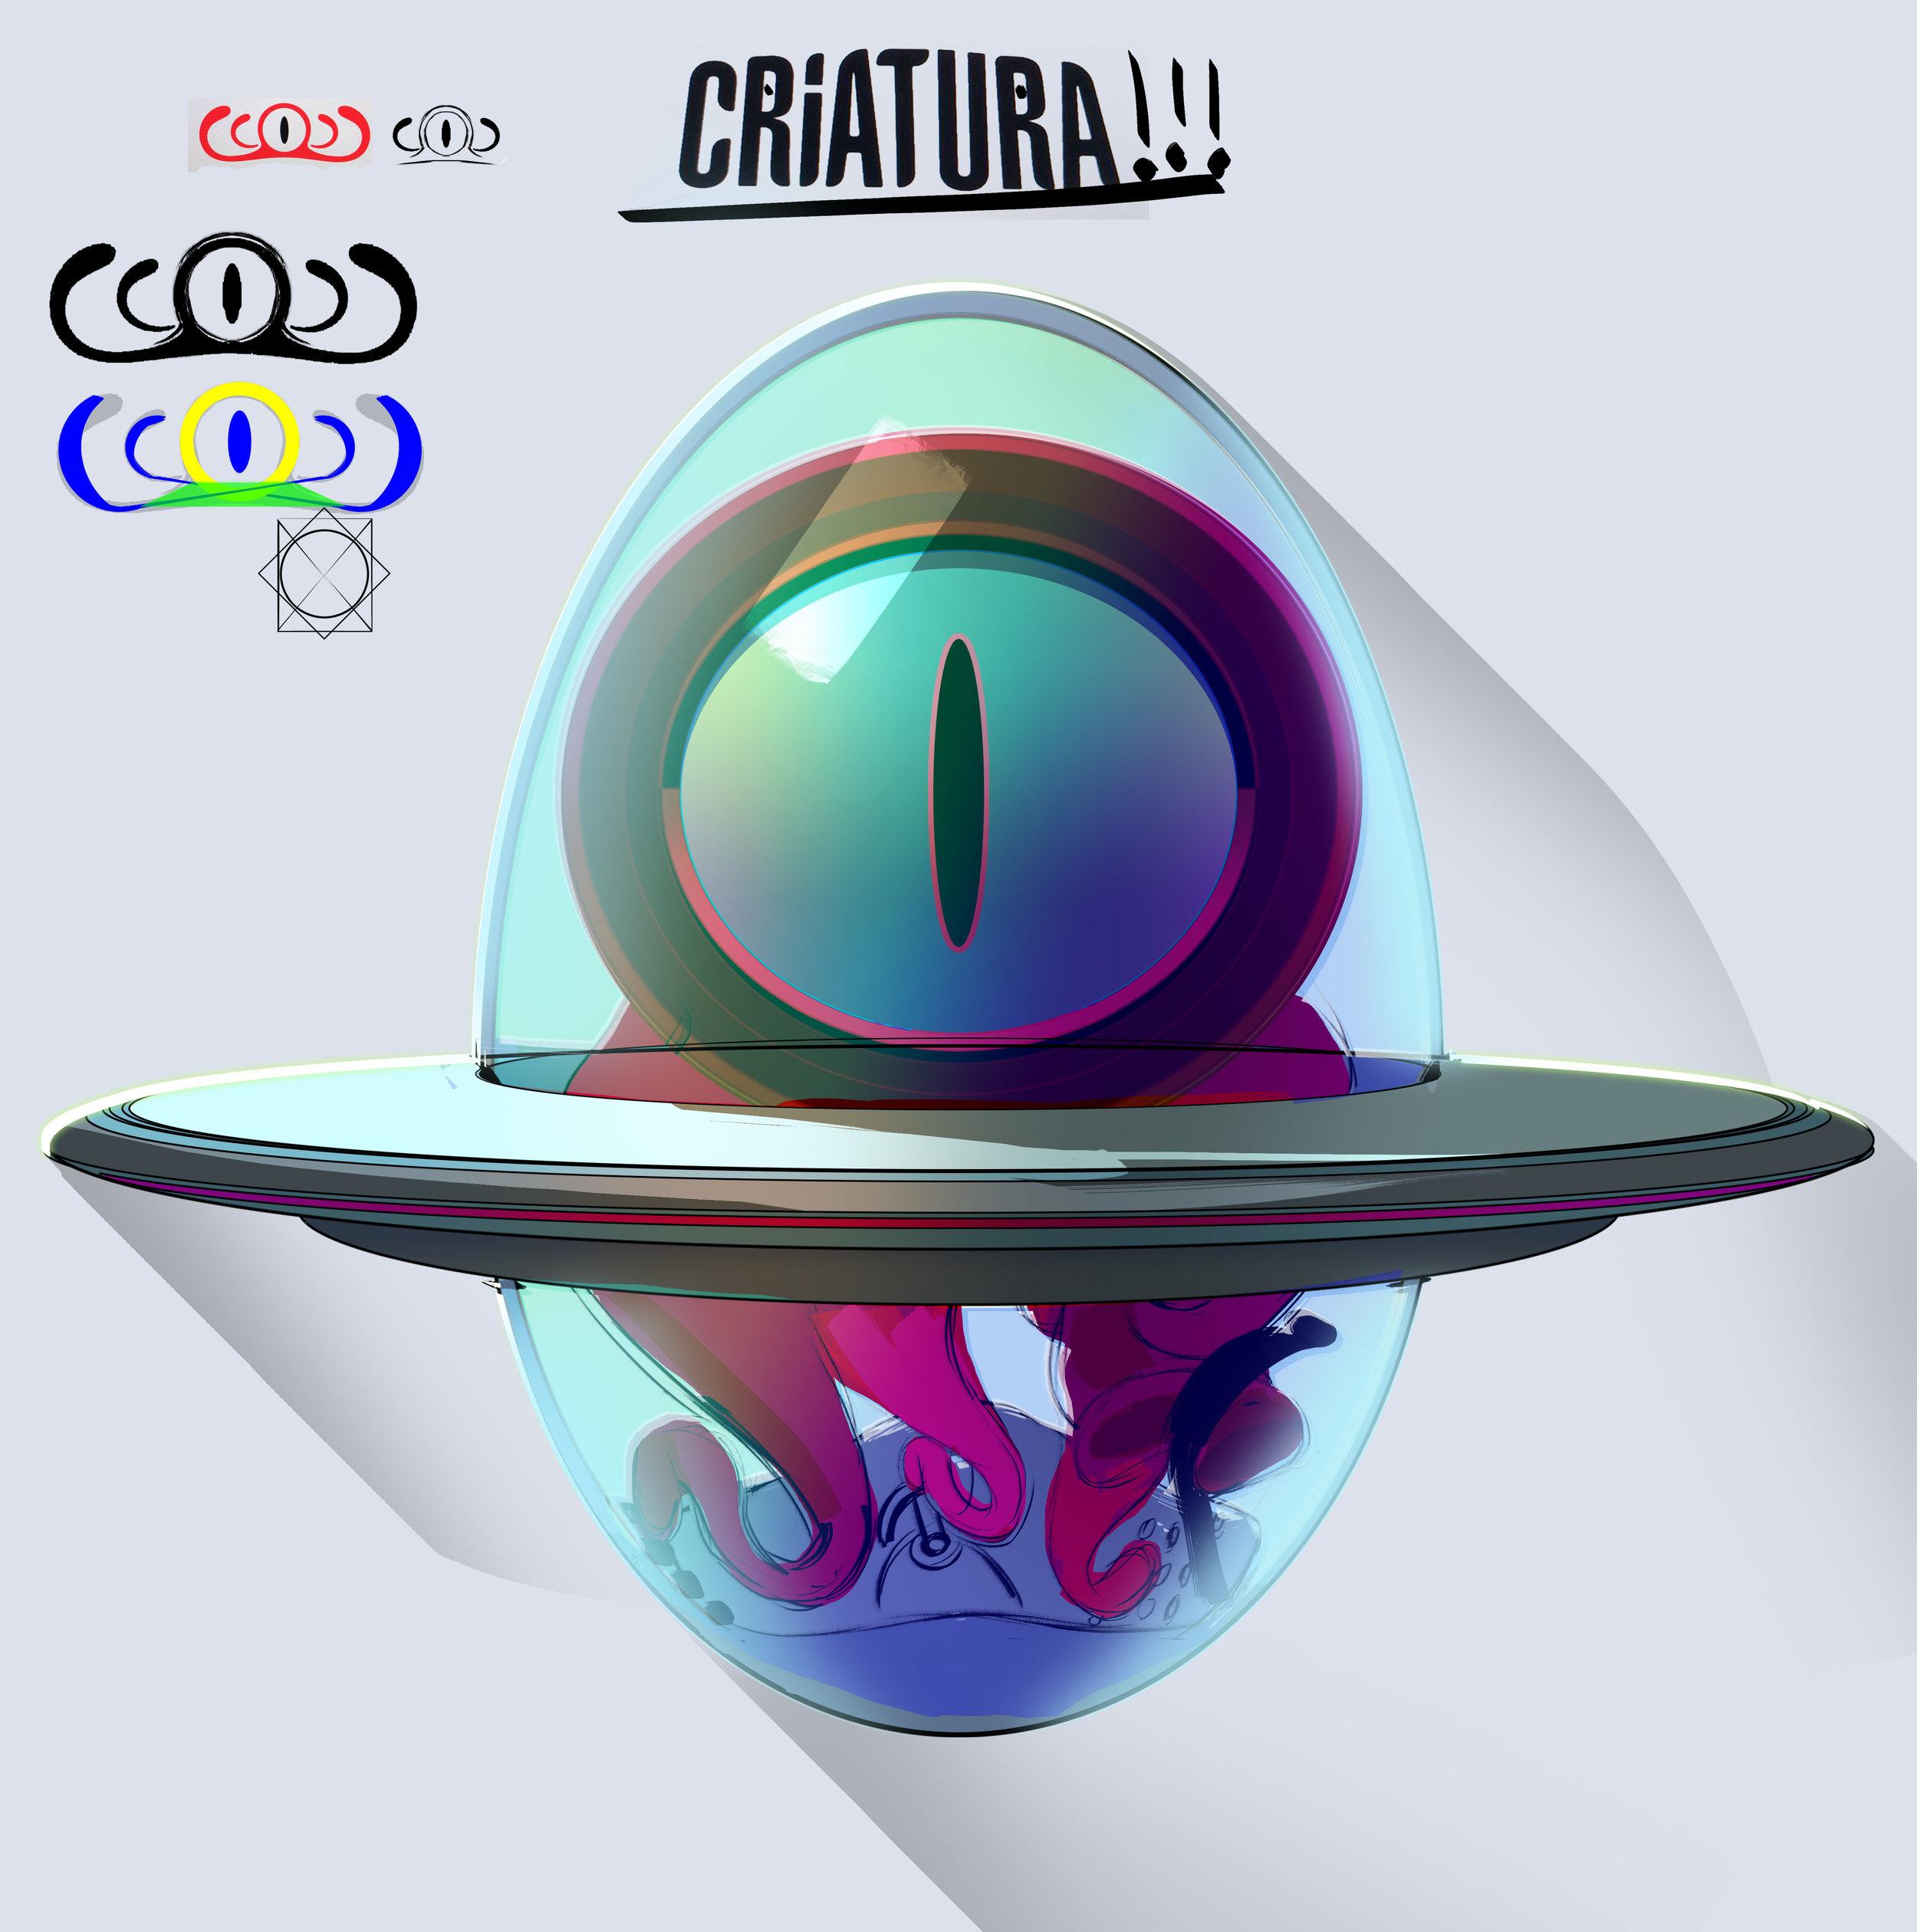 criatura 2.jpg